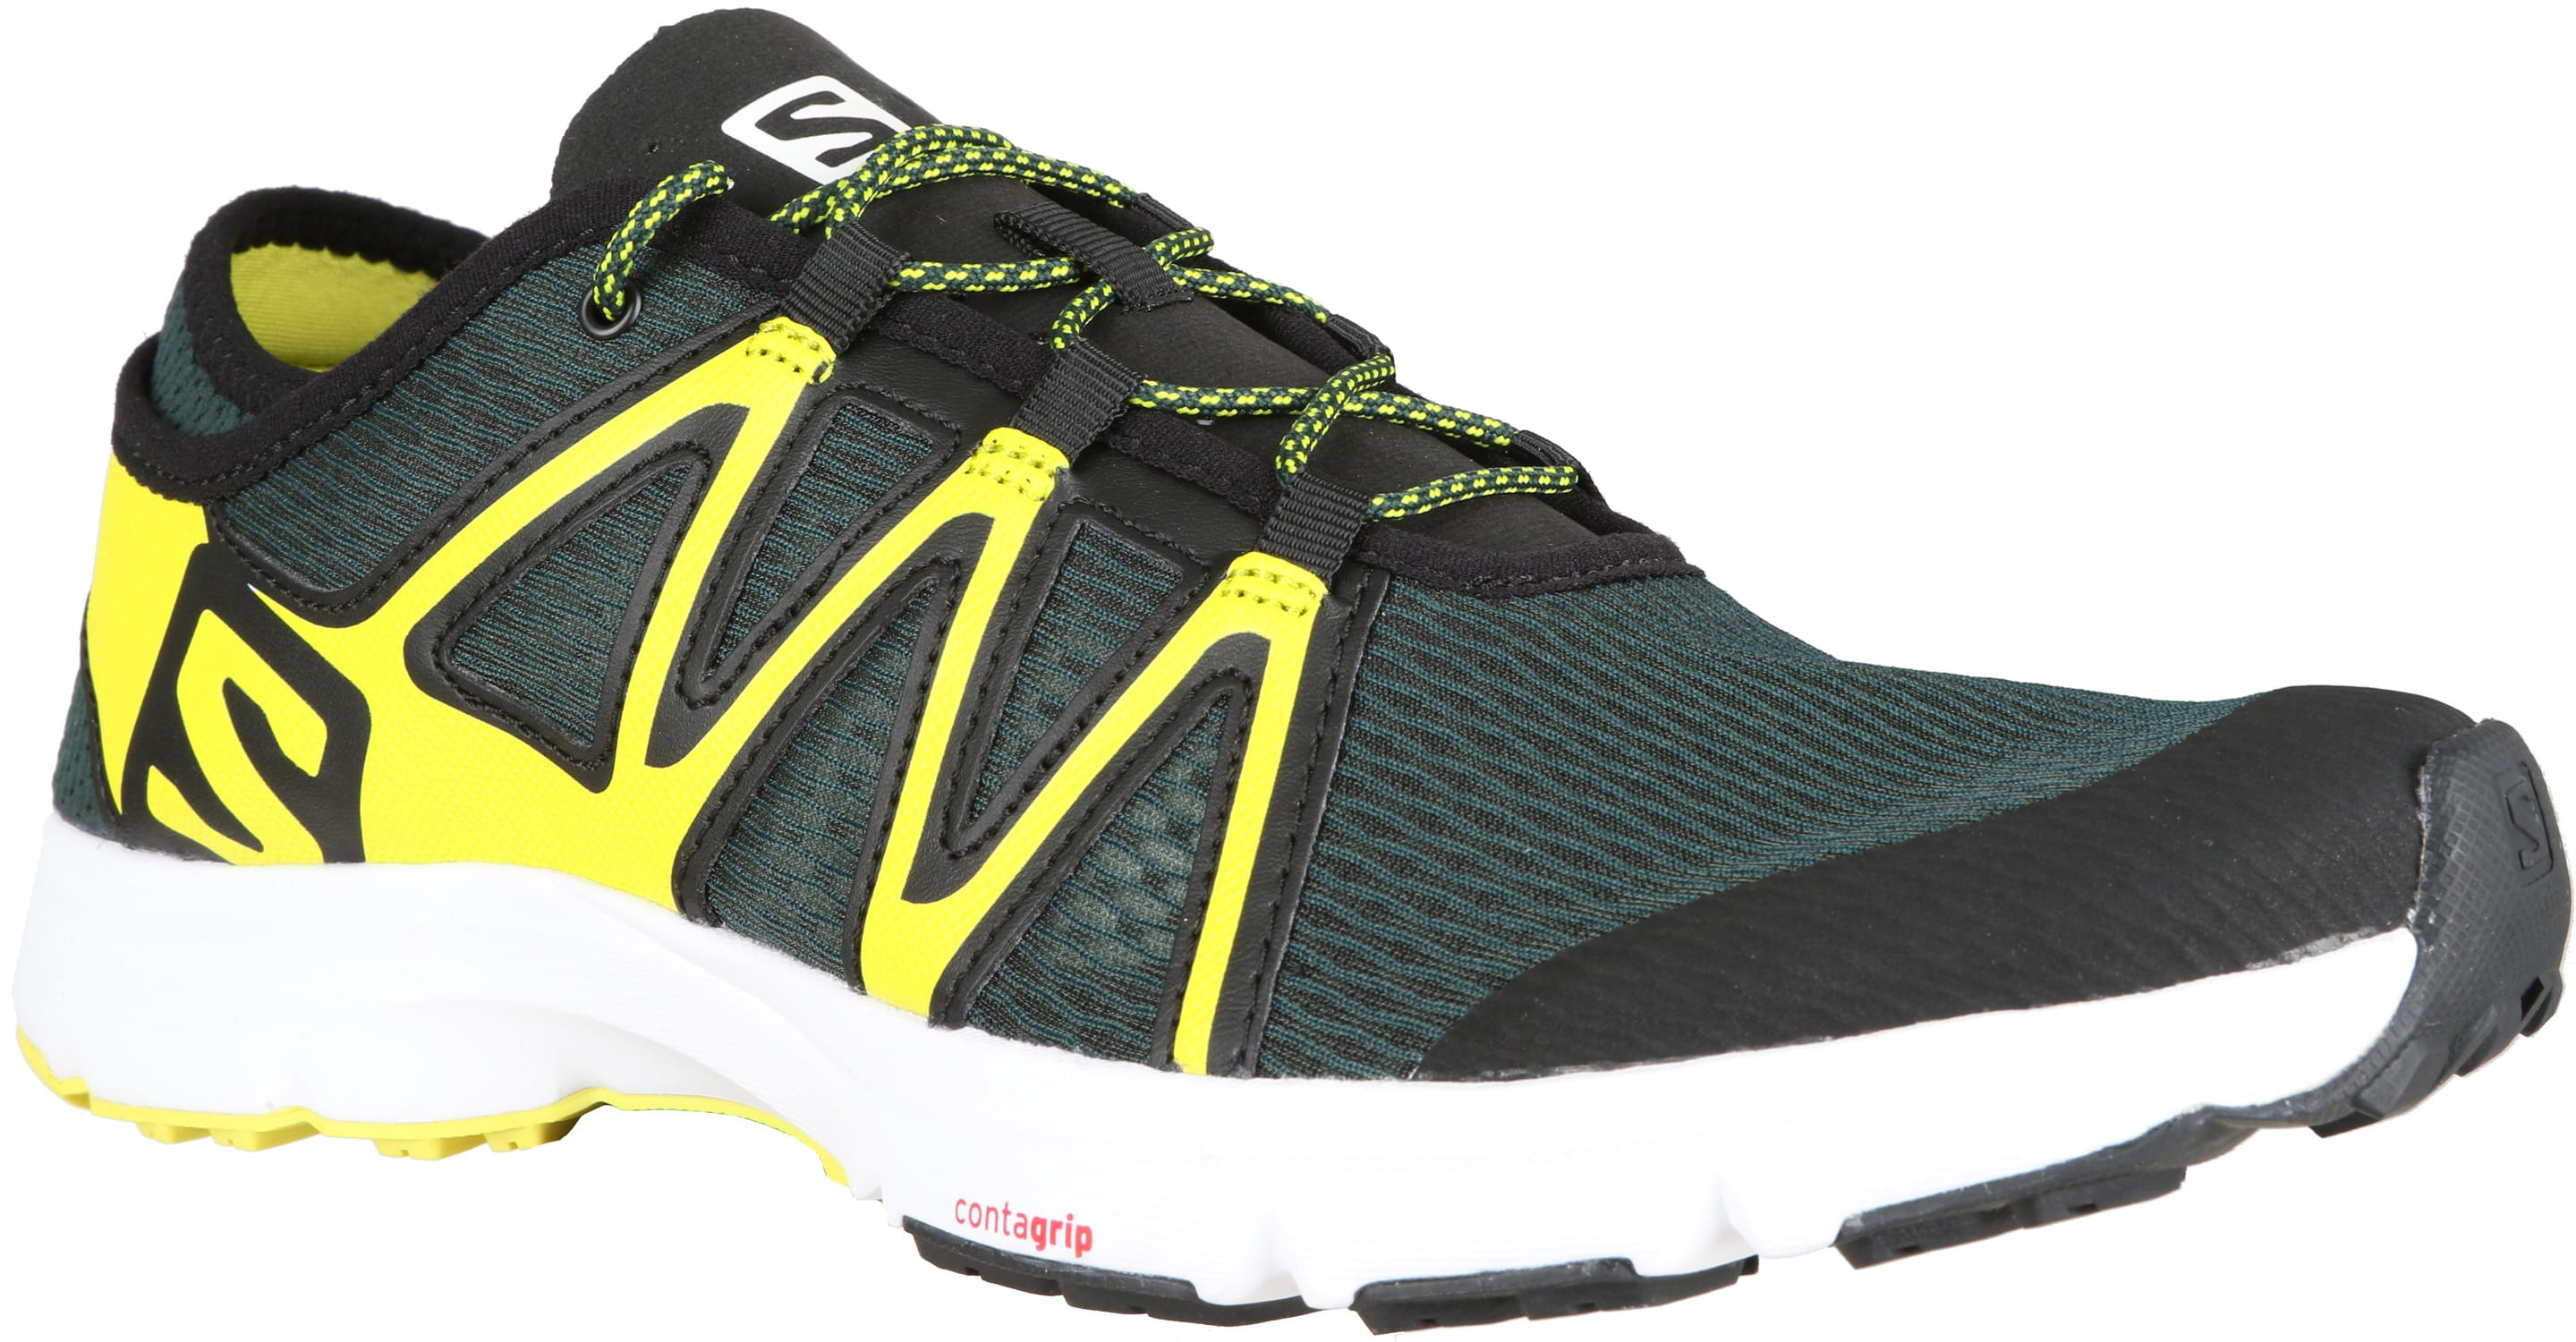 9c86ef1c81e0 Salomon Crossamphibian Swift Water Shoes - thumbnail 2